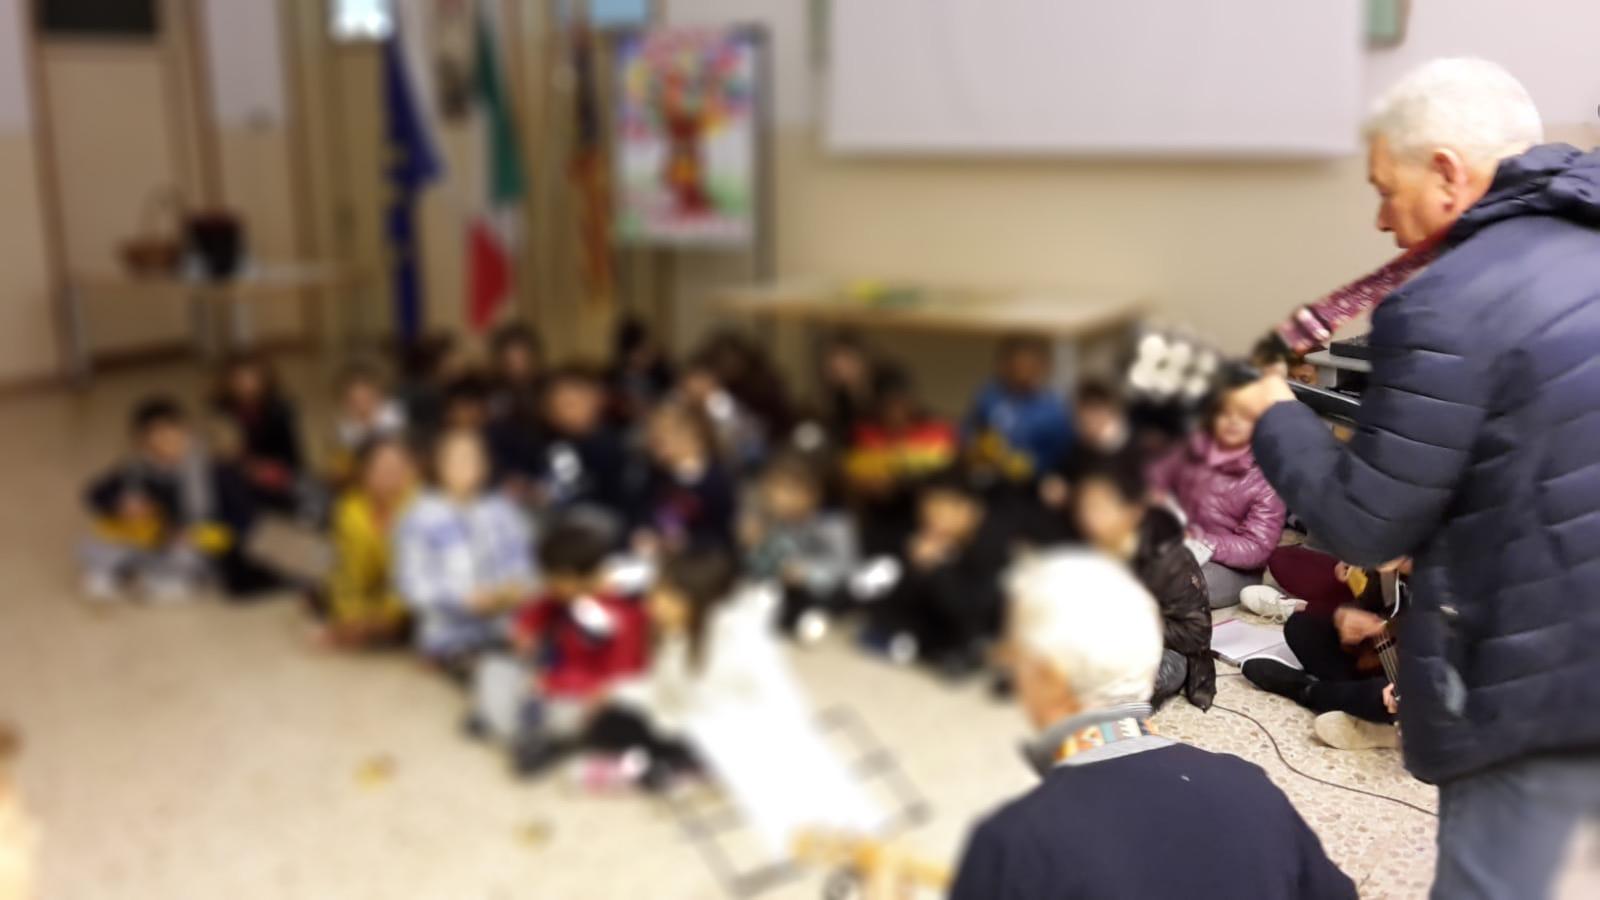 bambini che partecipano all'evento